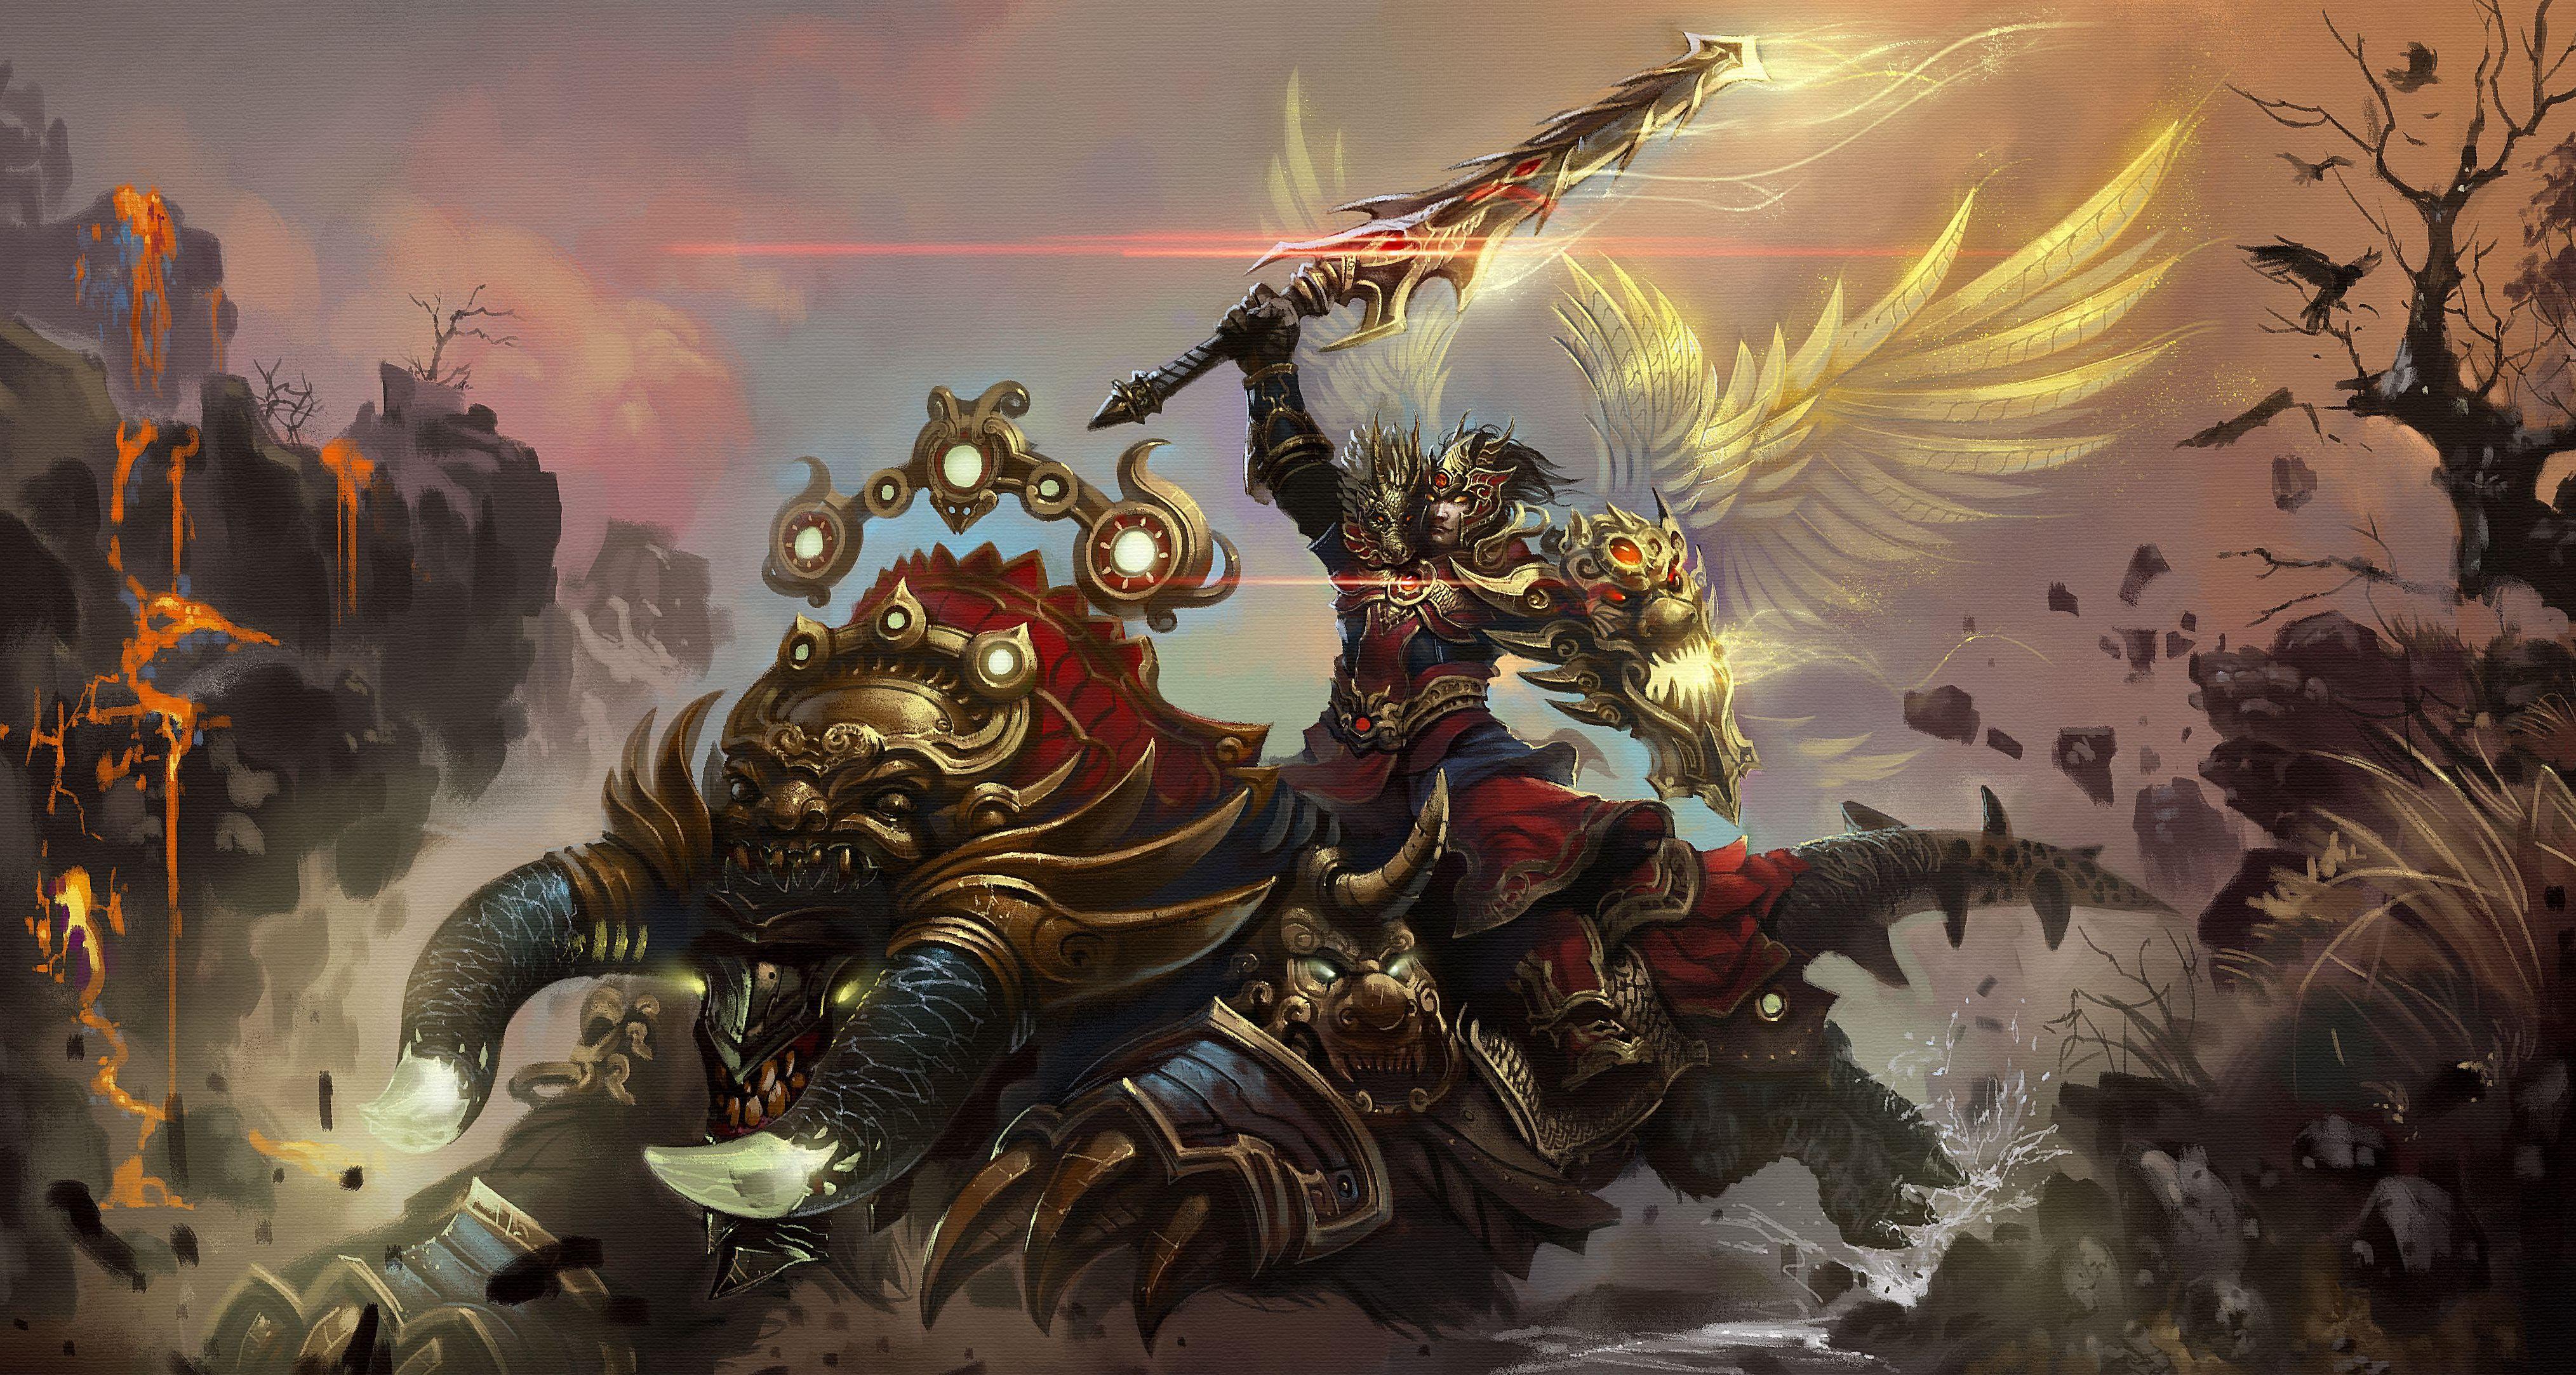 Fantasy samurai armor